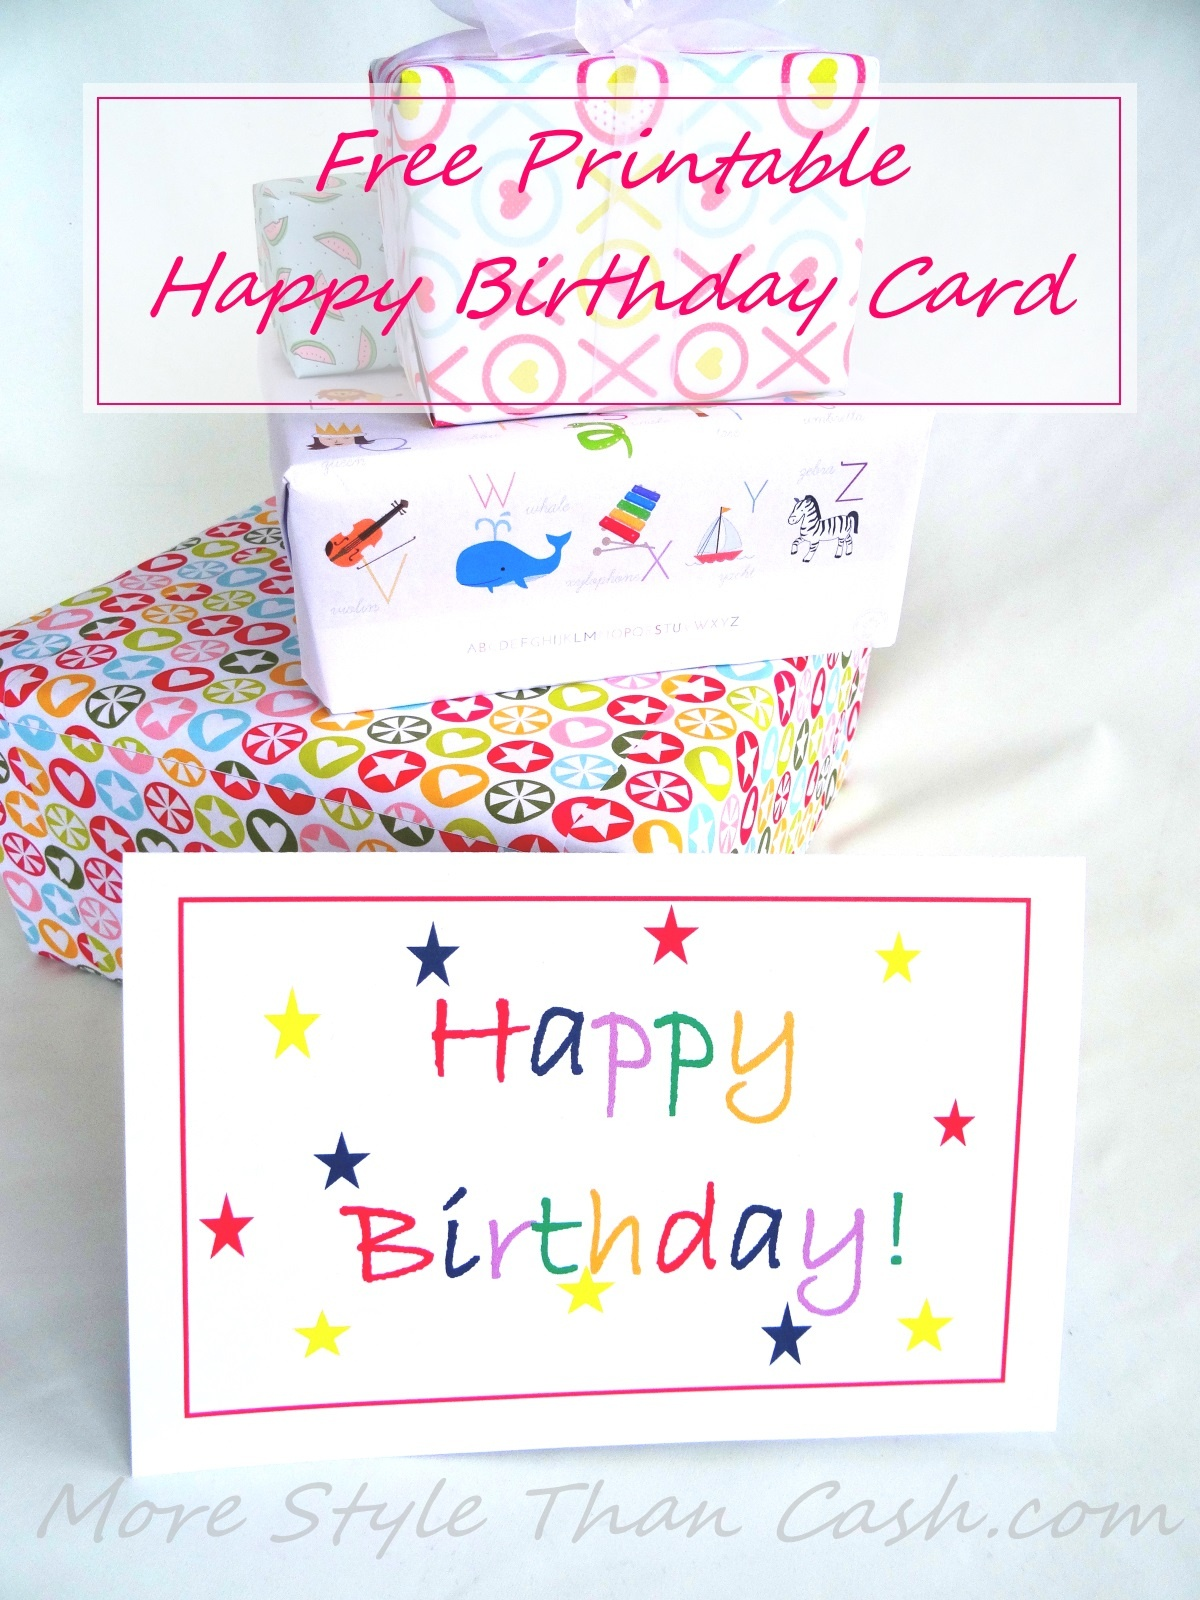 Free Printable Birthday Card - Free Printable Greeting Cards